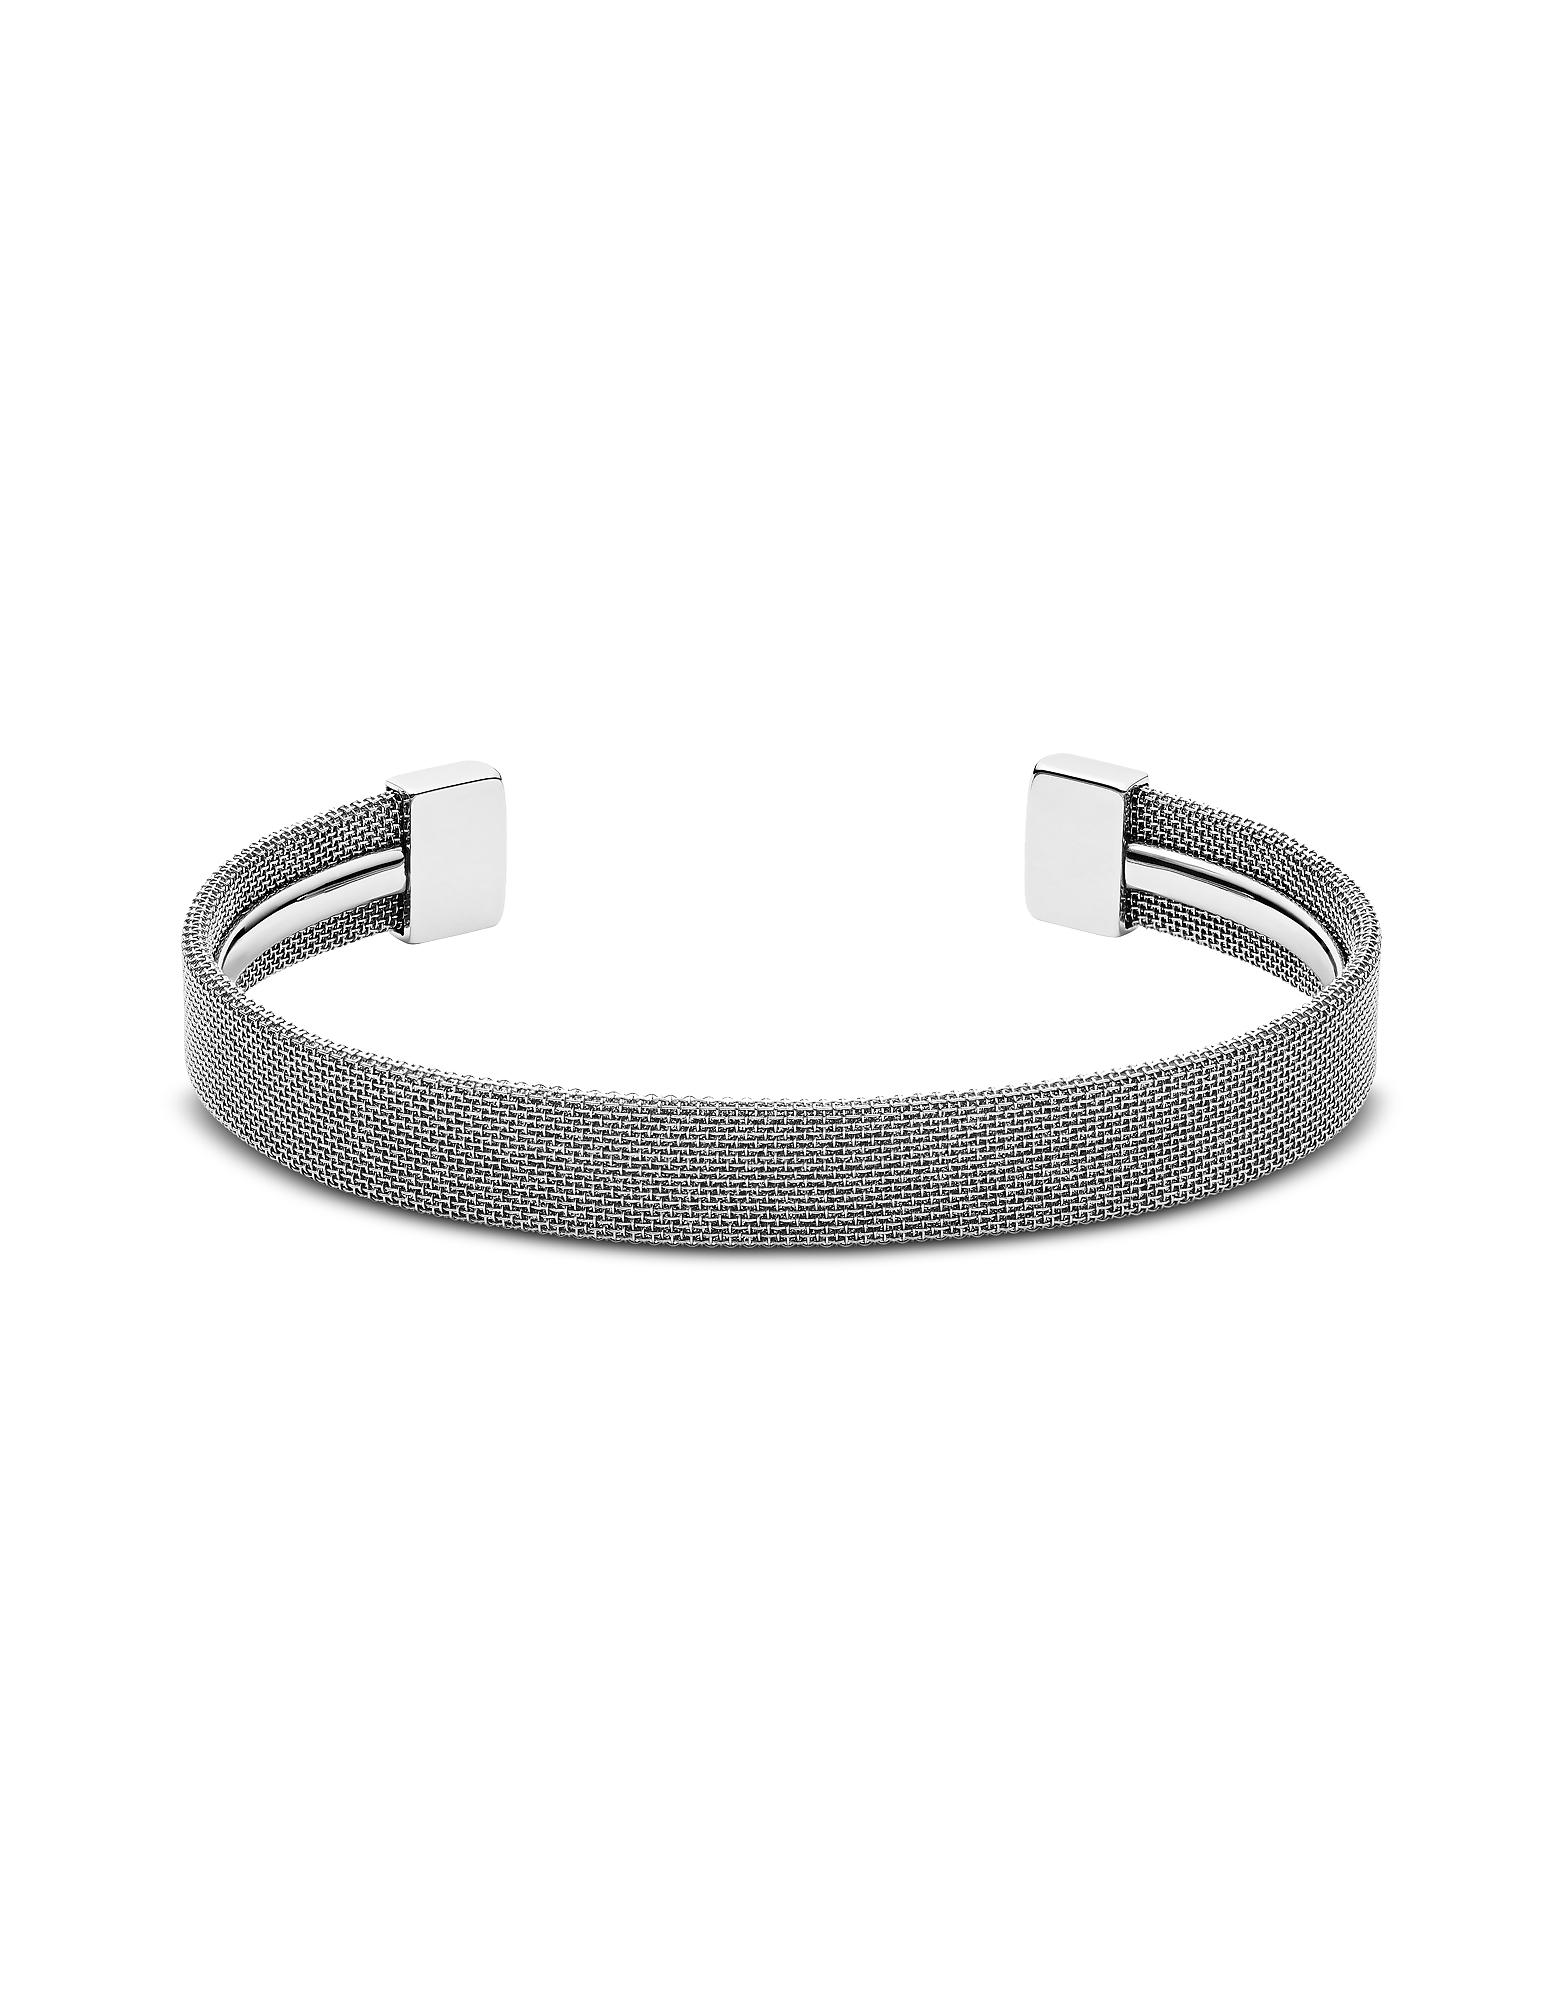 Skagen Bracelets, SKJ1151040 Merete Women's Bracelet